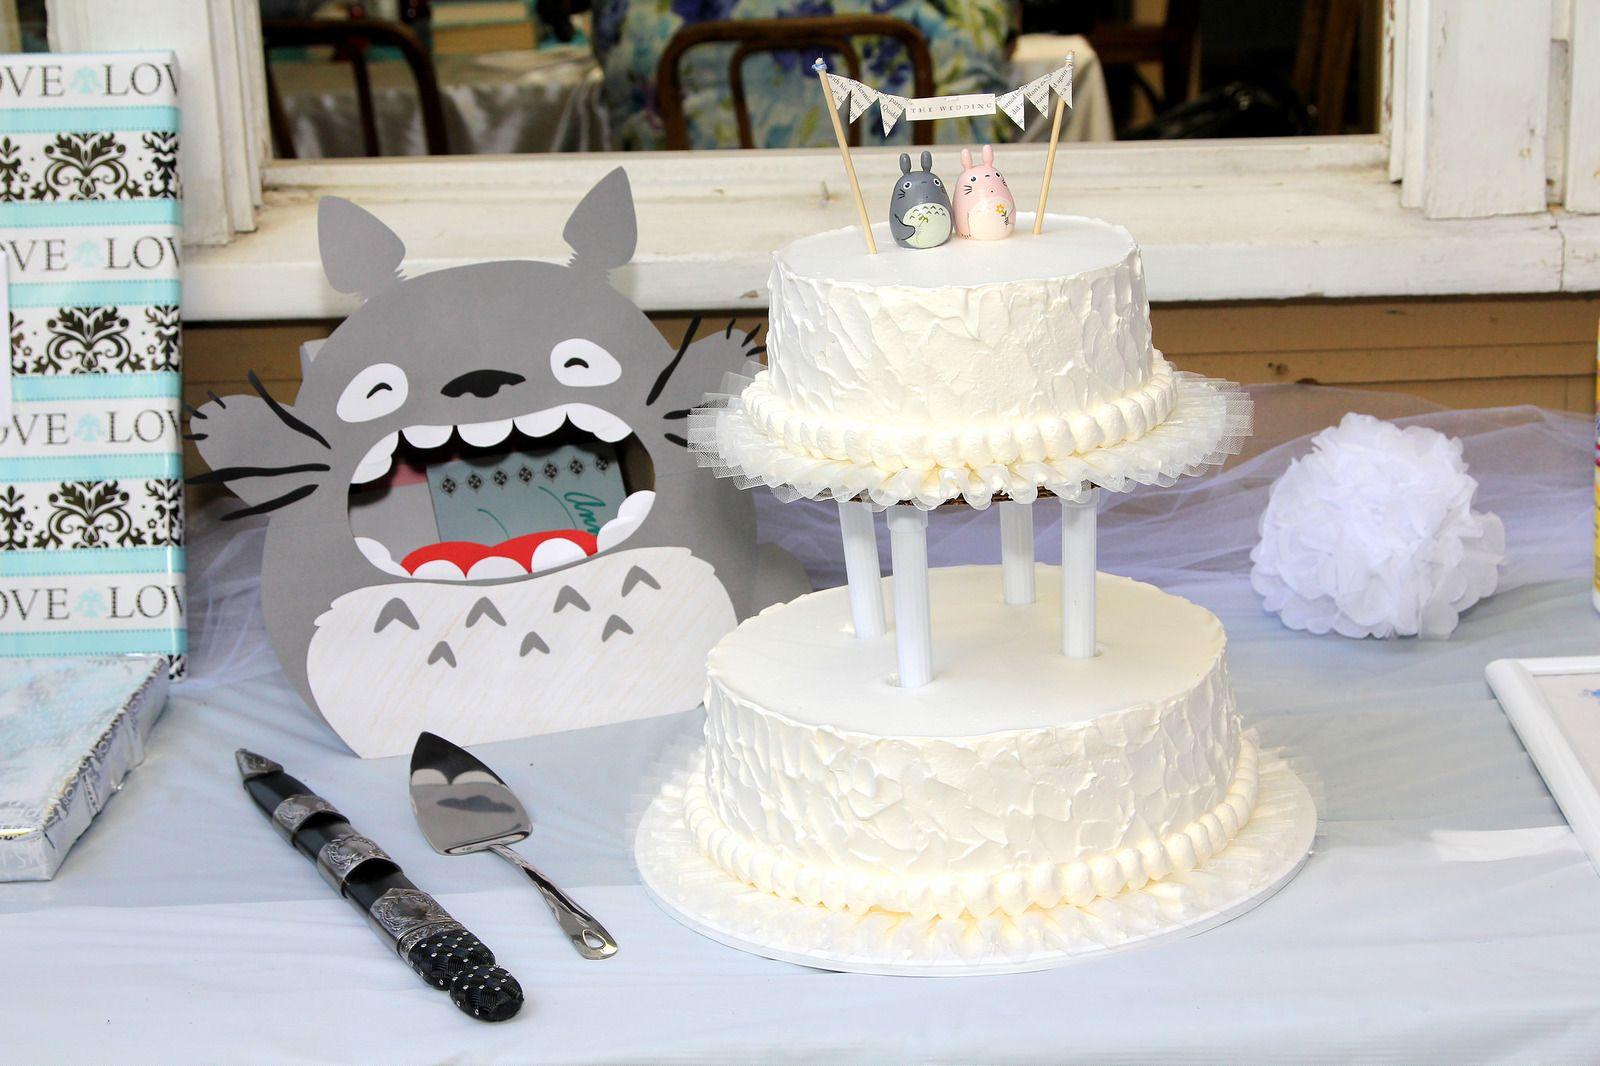 IMG (530) | Geek wedding